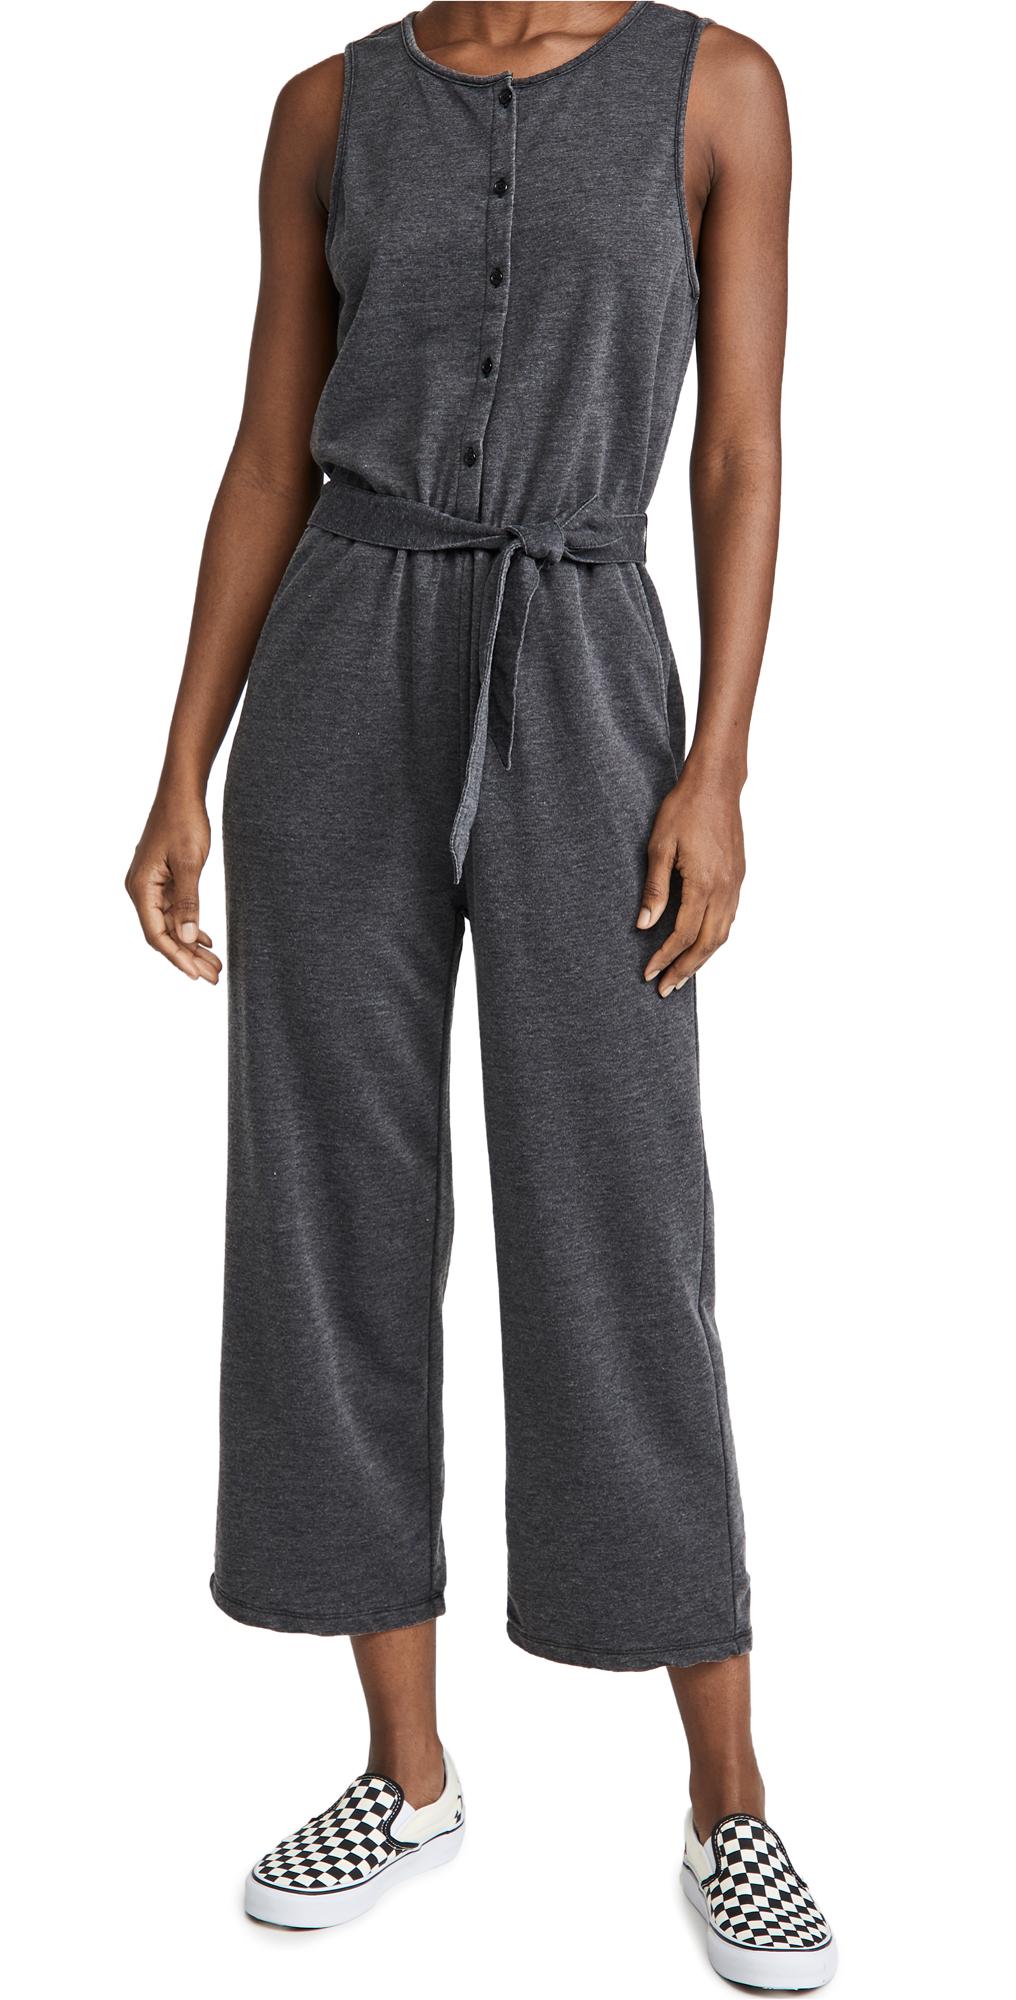 Z Supply Clio Jumpsuit